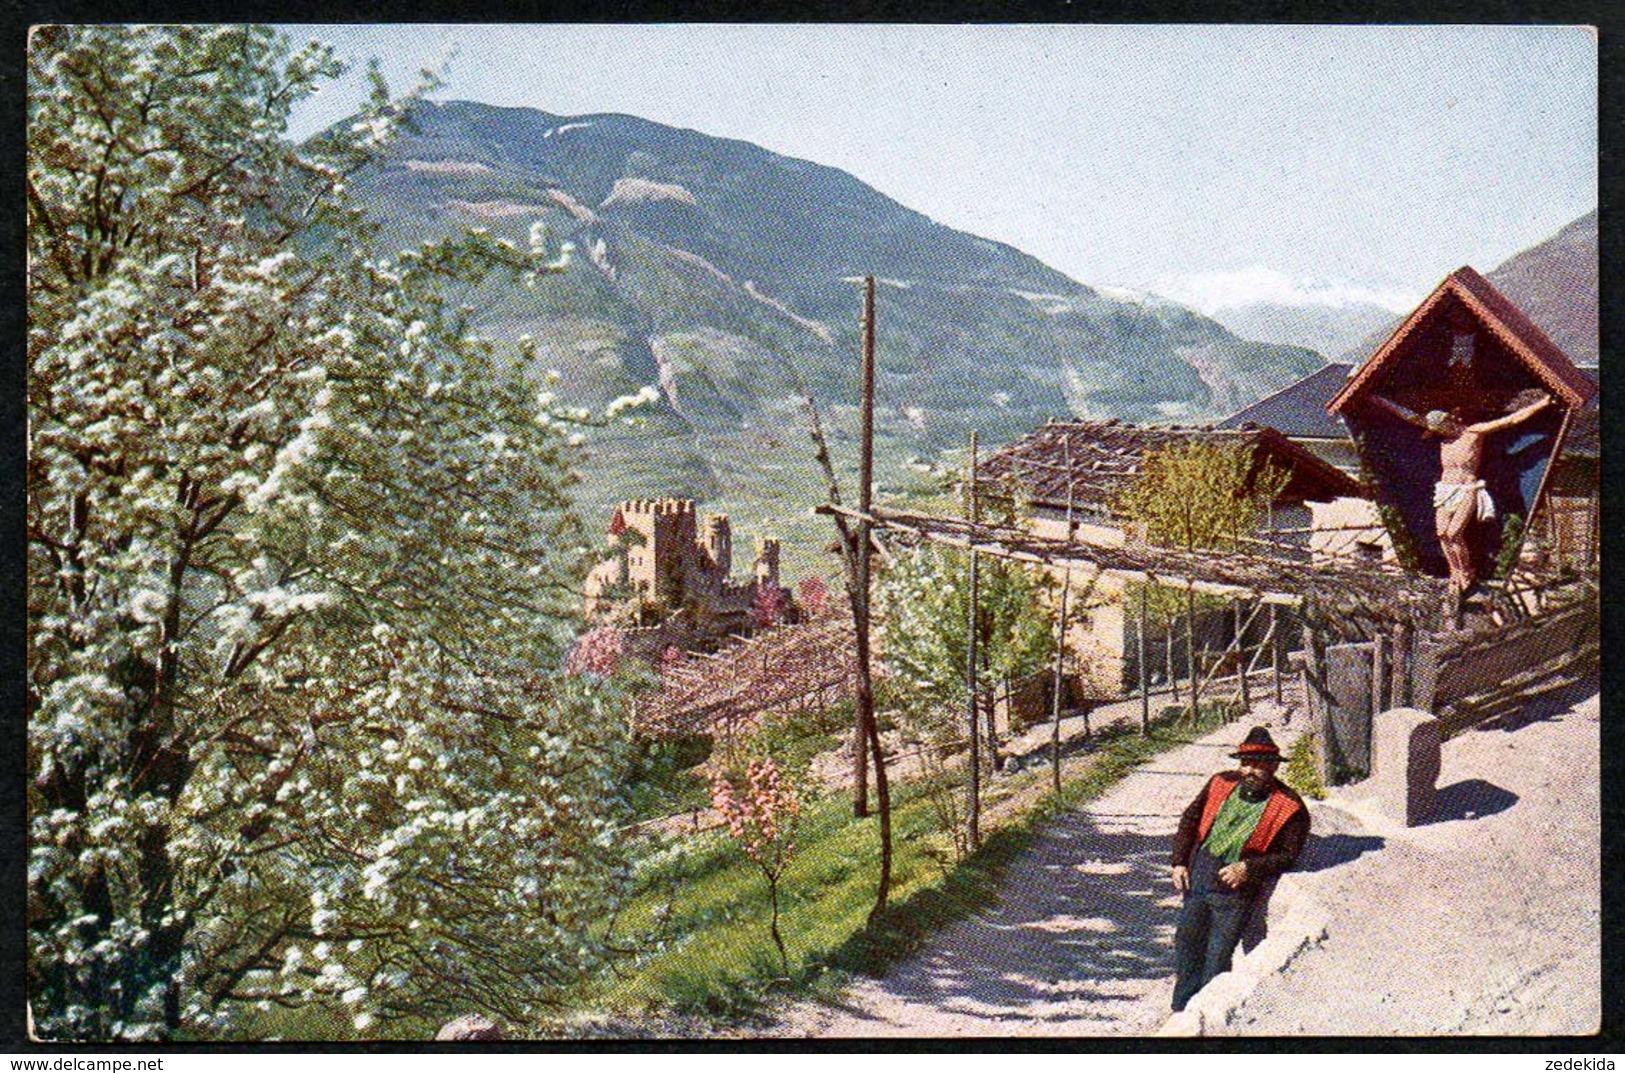 B4871 - Dorf Tirol Bei Meran - Brunnenburg Farbenfoto Hans Hildenbrand Stuttgart - Merano